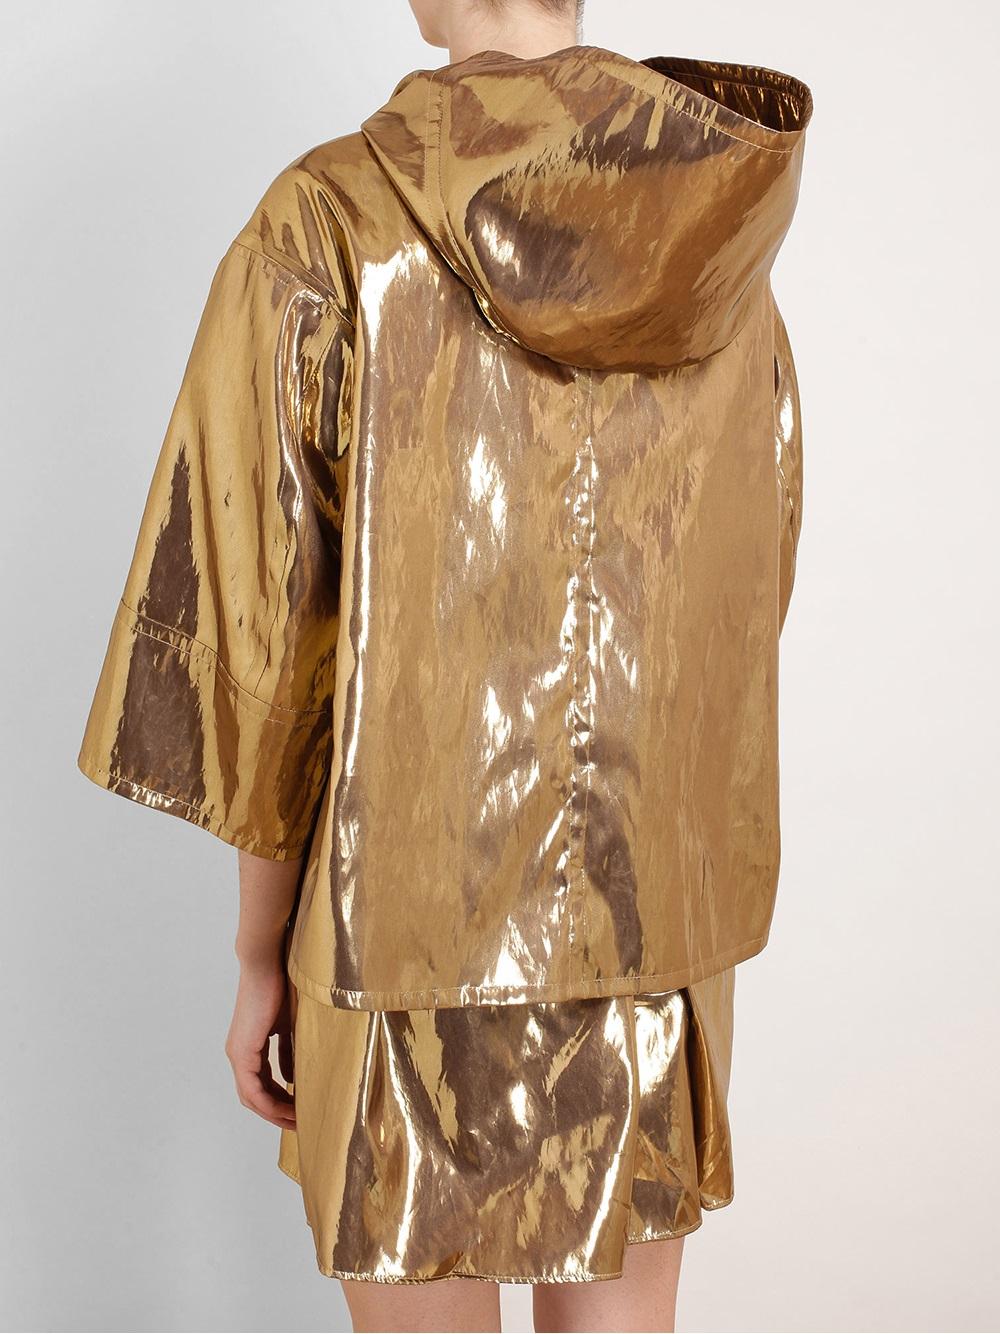 26379240ea2 N°21 Hooded Metallic Parka Jacket in Metallic - Lyst